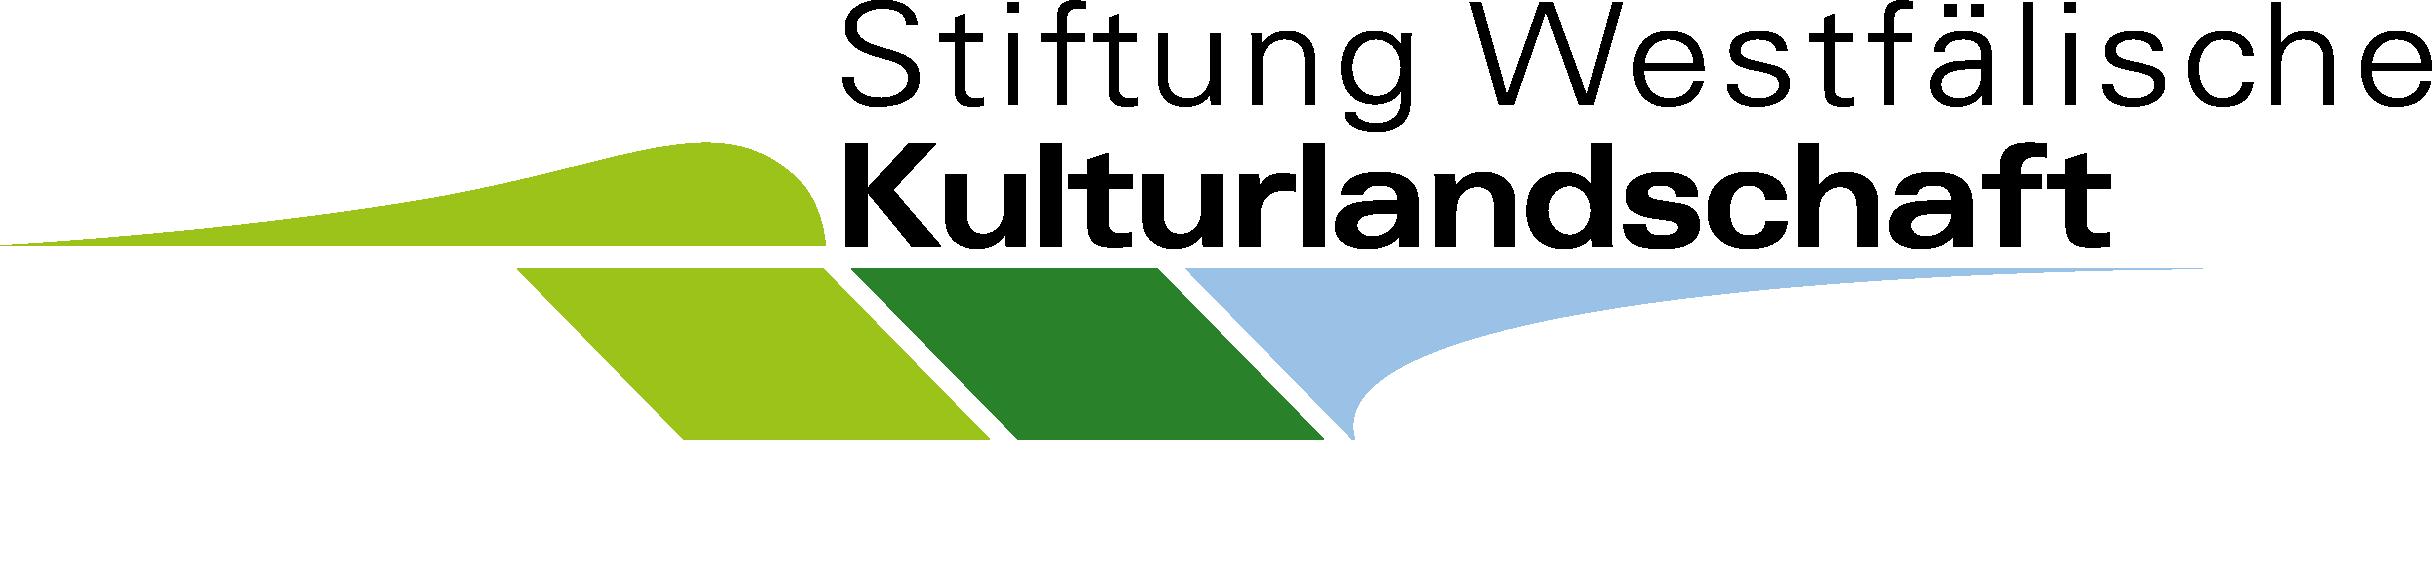 Stiftung Westfälische Kulturlandschaft